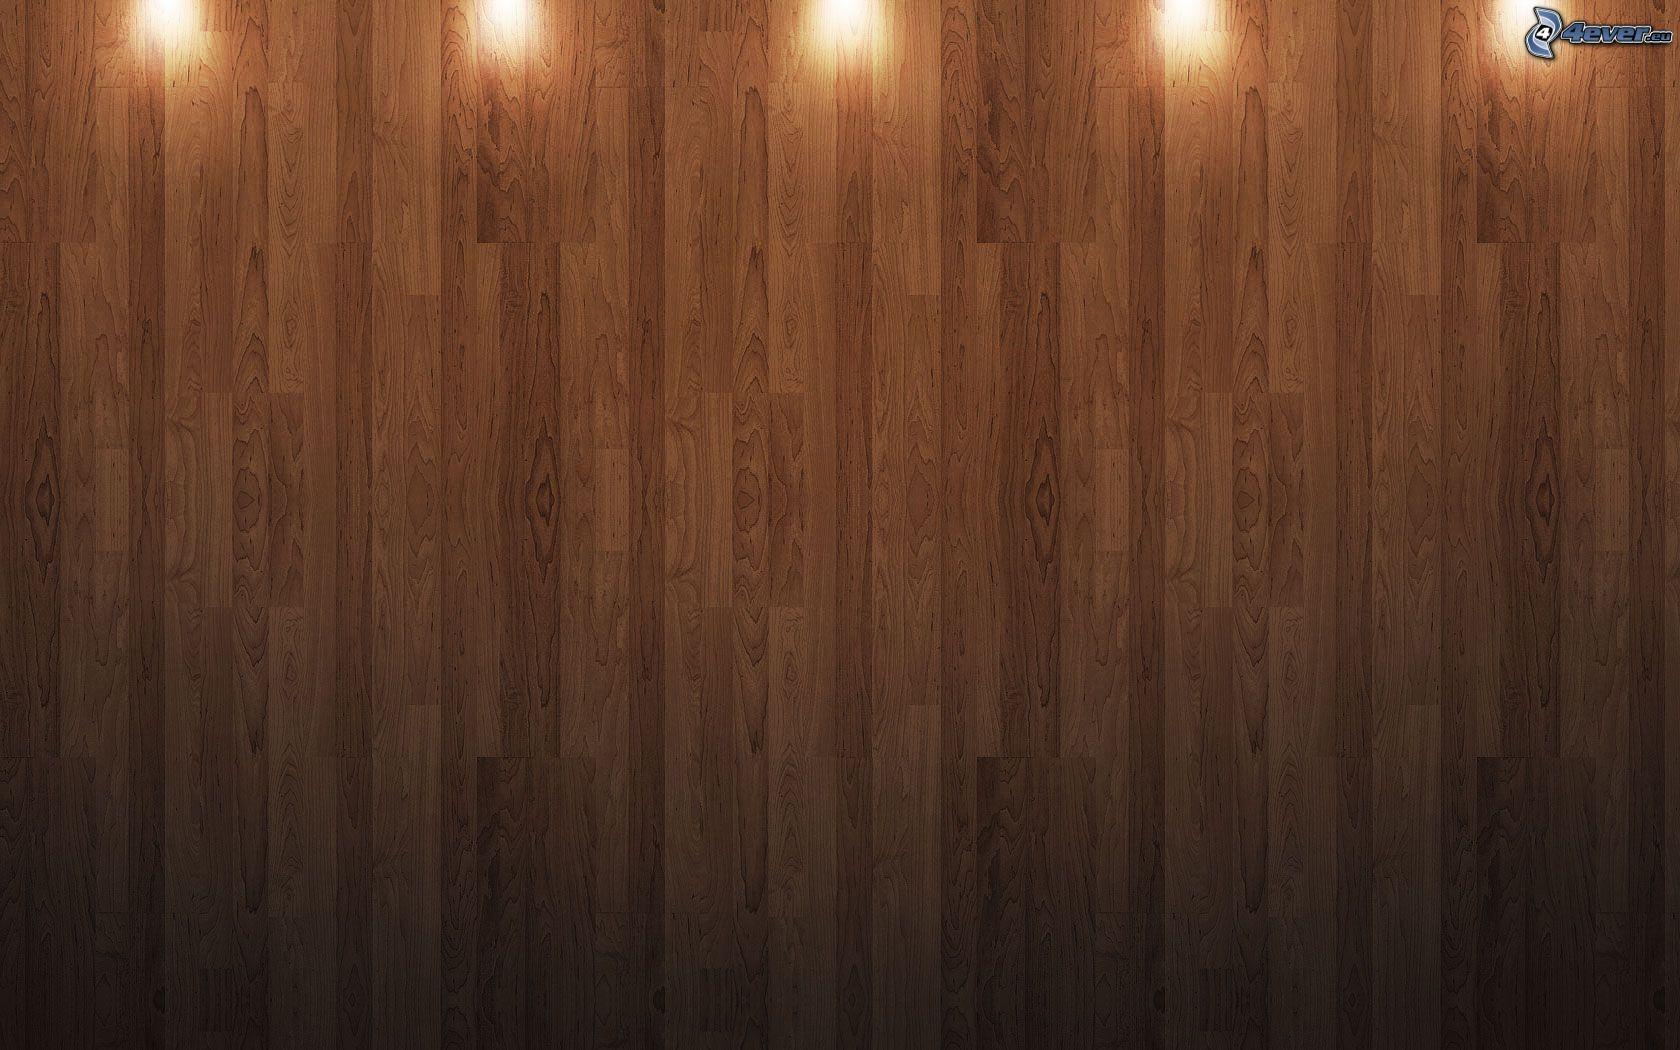 Assi Di Legno Hd : Pareti di legno perfect pareti di legno with pareti di legno